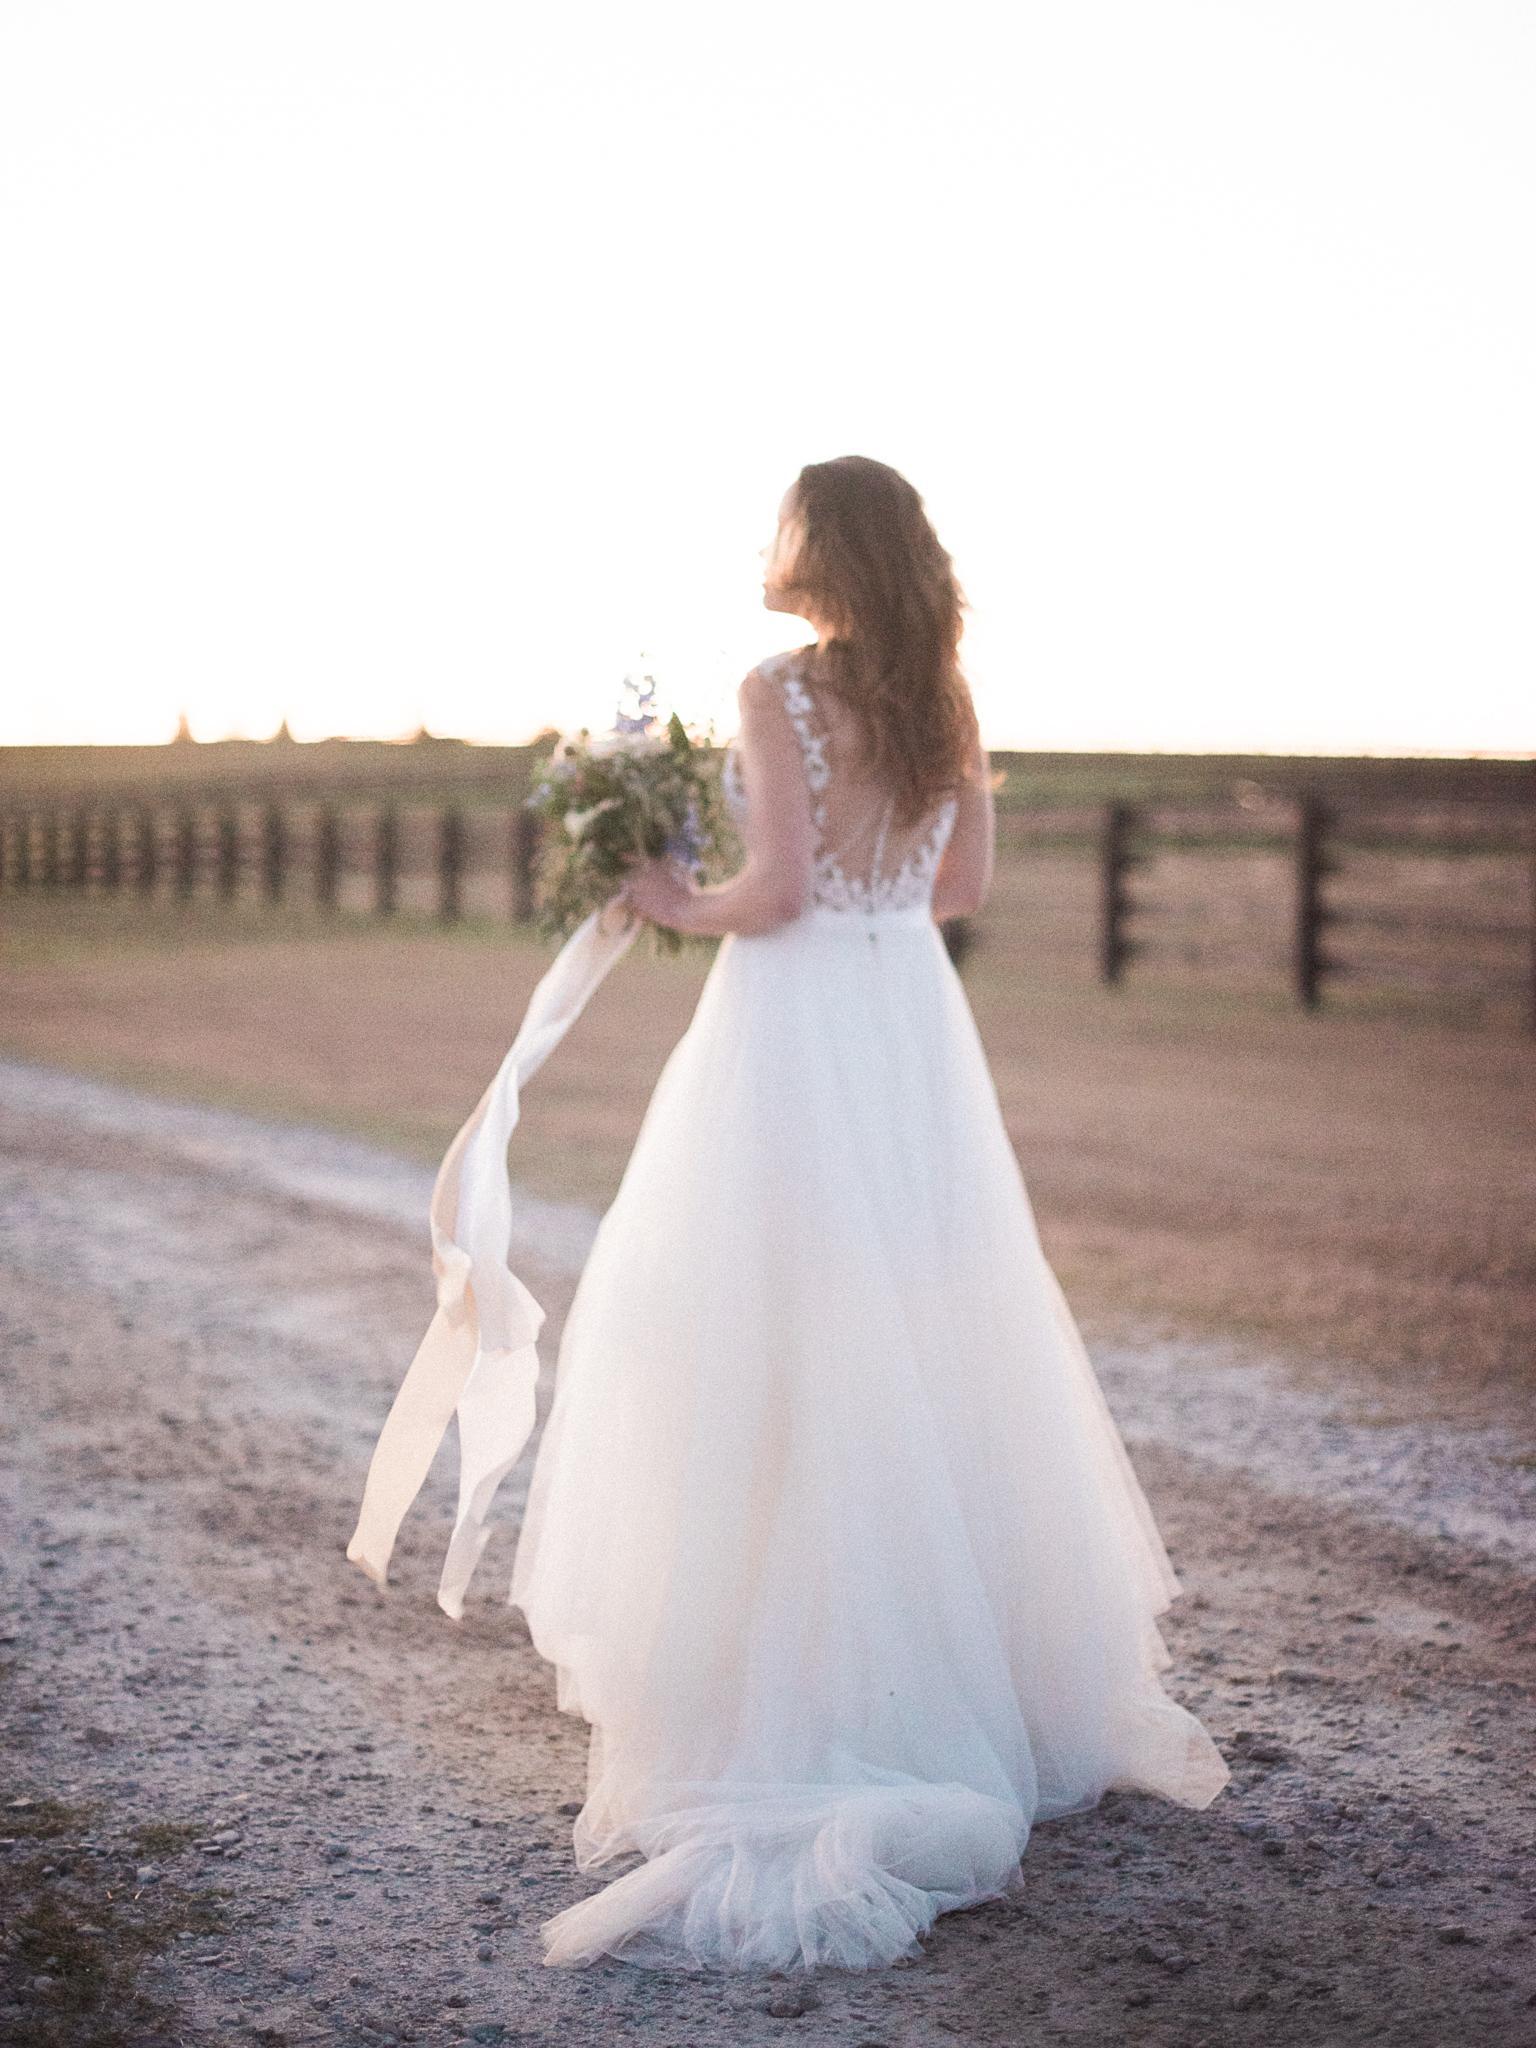 christinadavis+weddinginspiration01.jpg